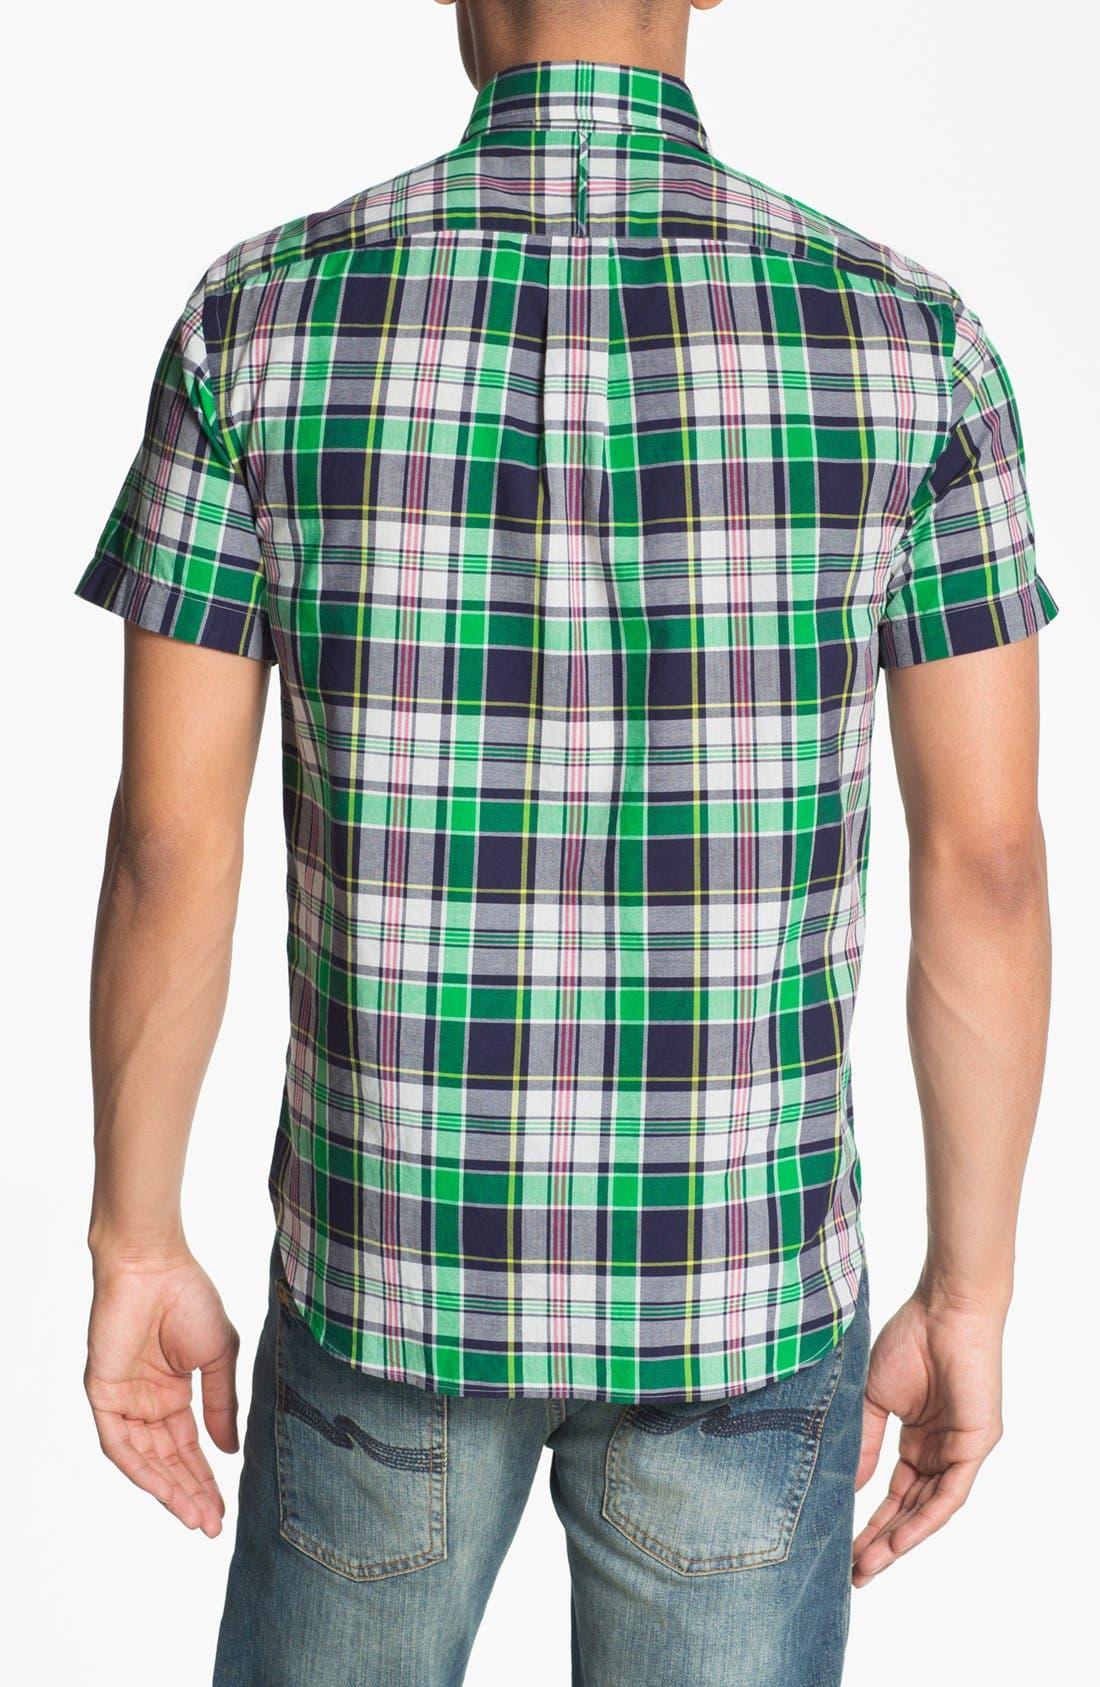 Alternate Image 3  - J. Press York Street Short Sleeve Plaid Cotton Shirt